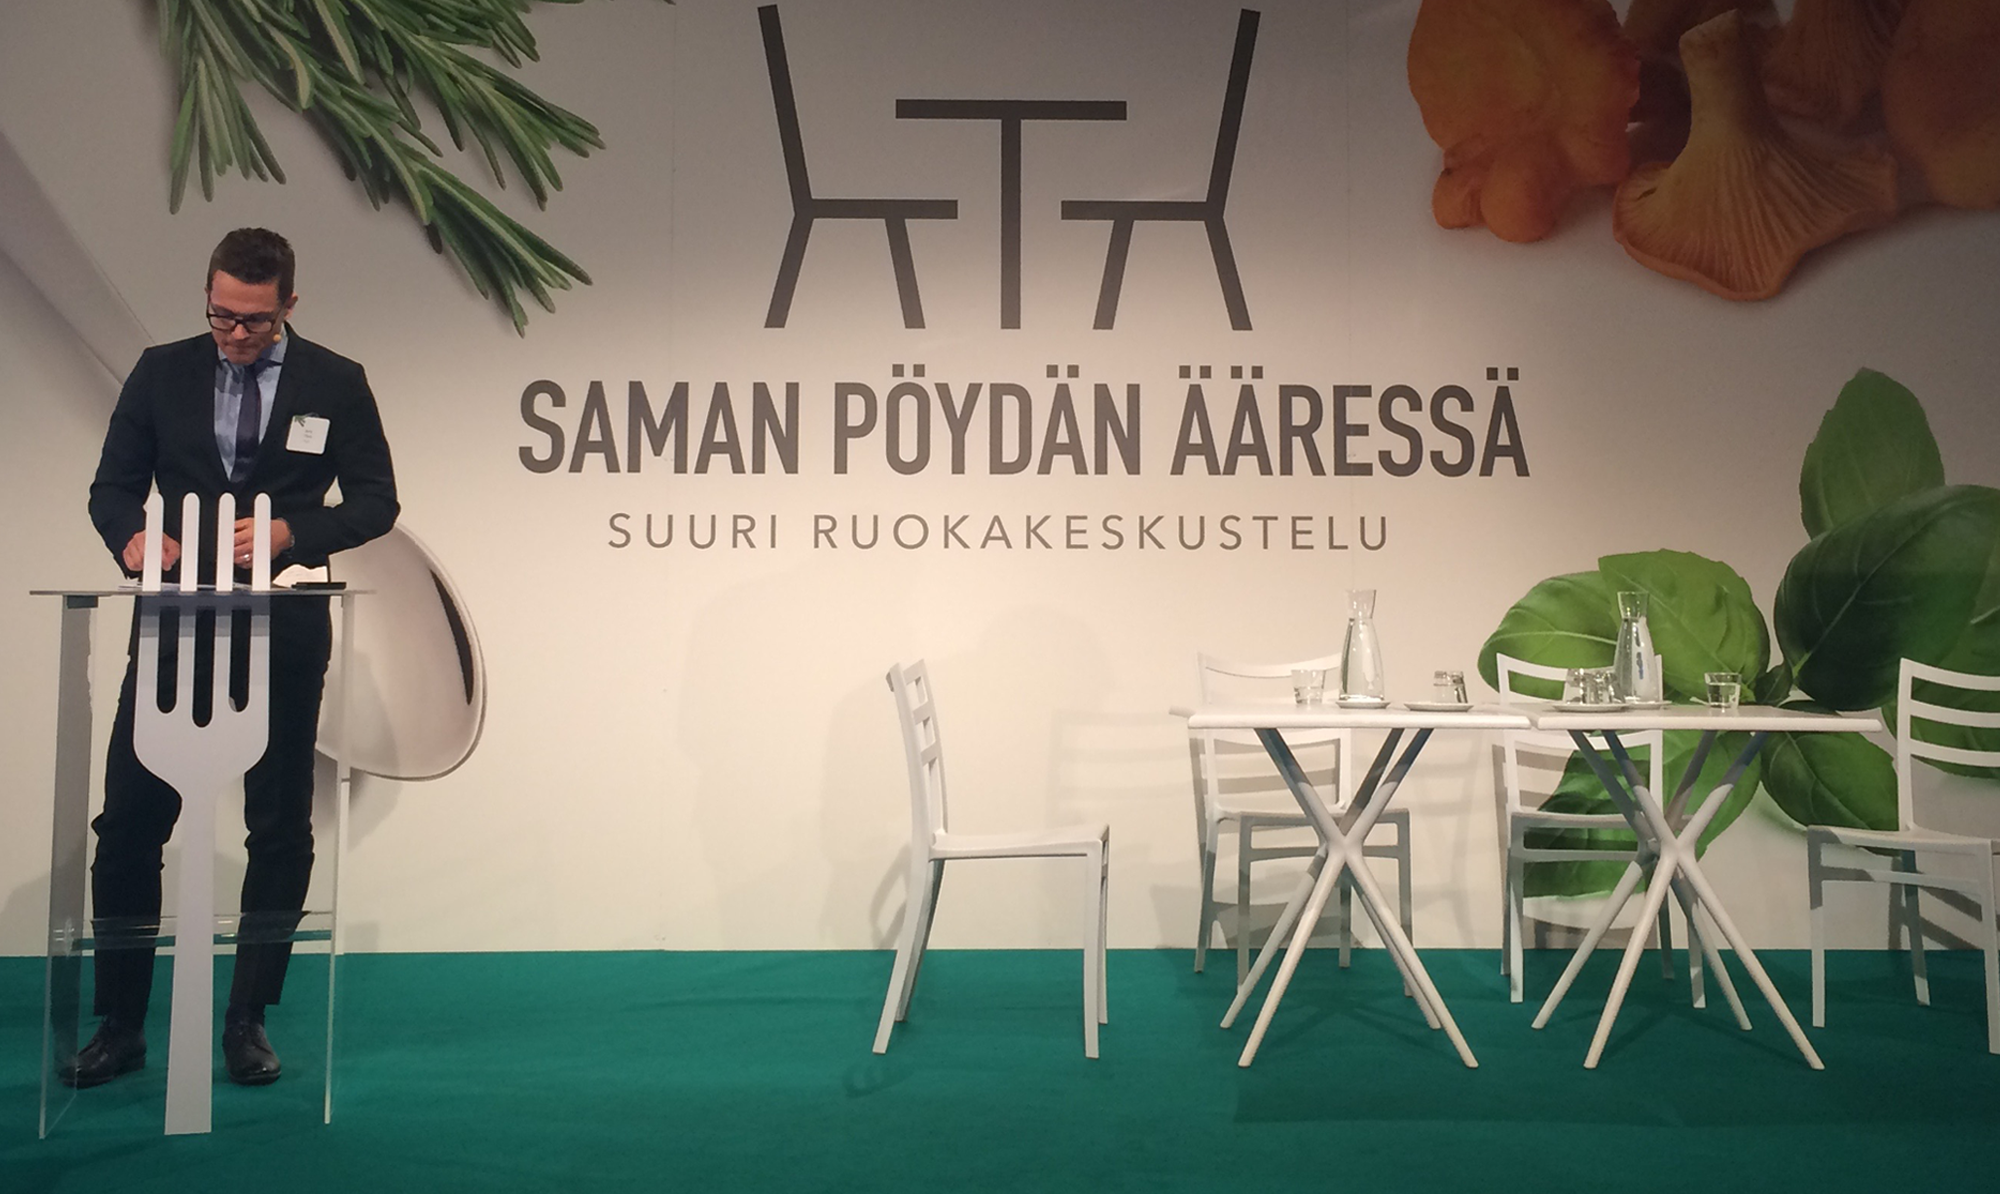 Referenssi_Saman_pöydän_ääressä_seminaari.png